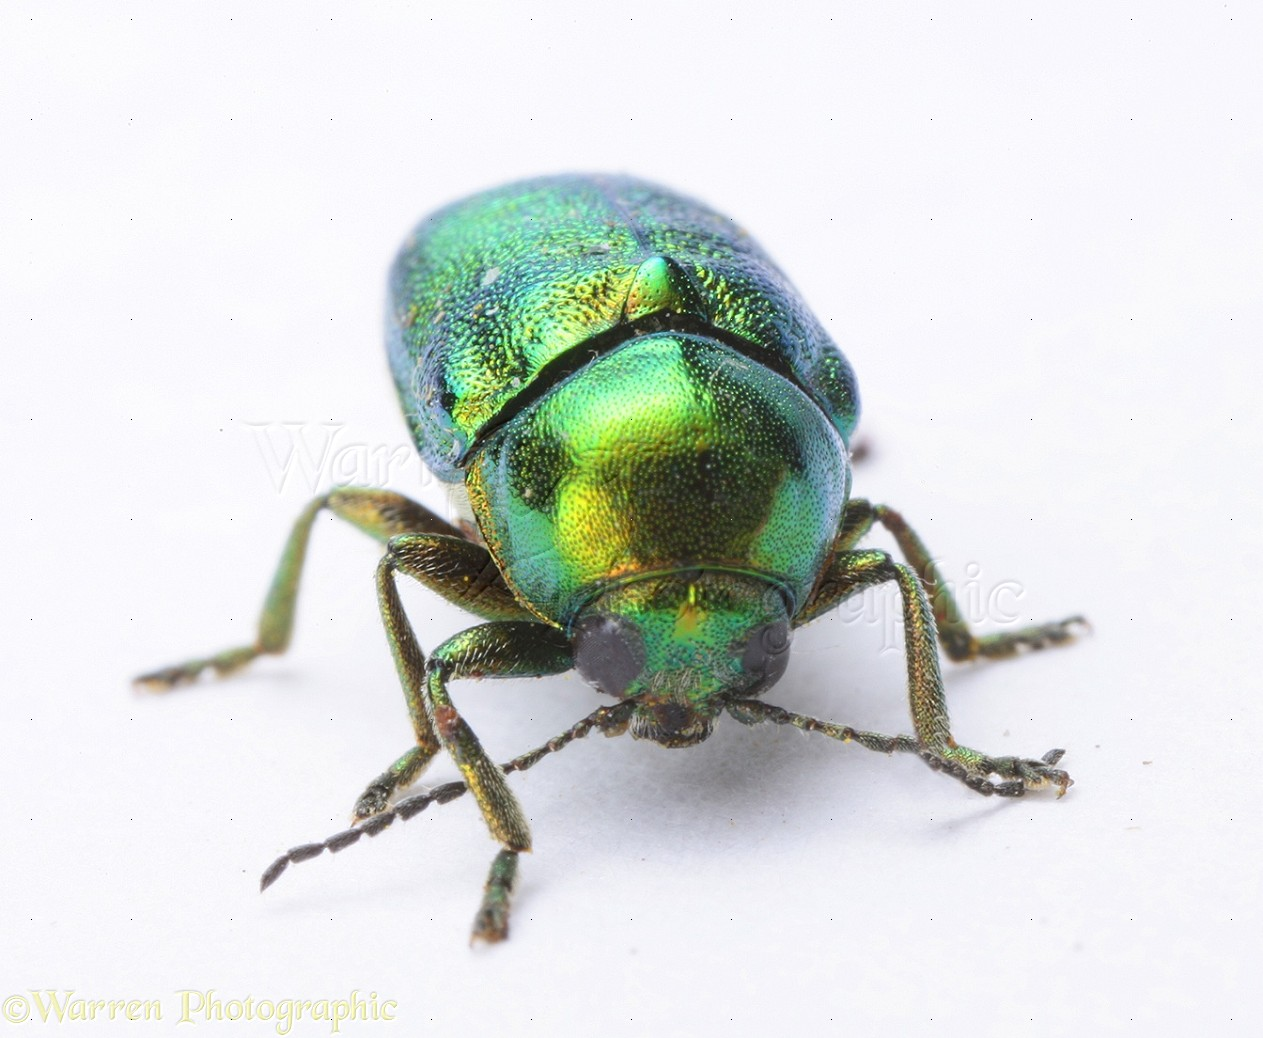 Leaf Beetle Photo Wp19492